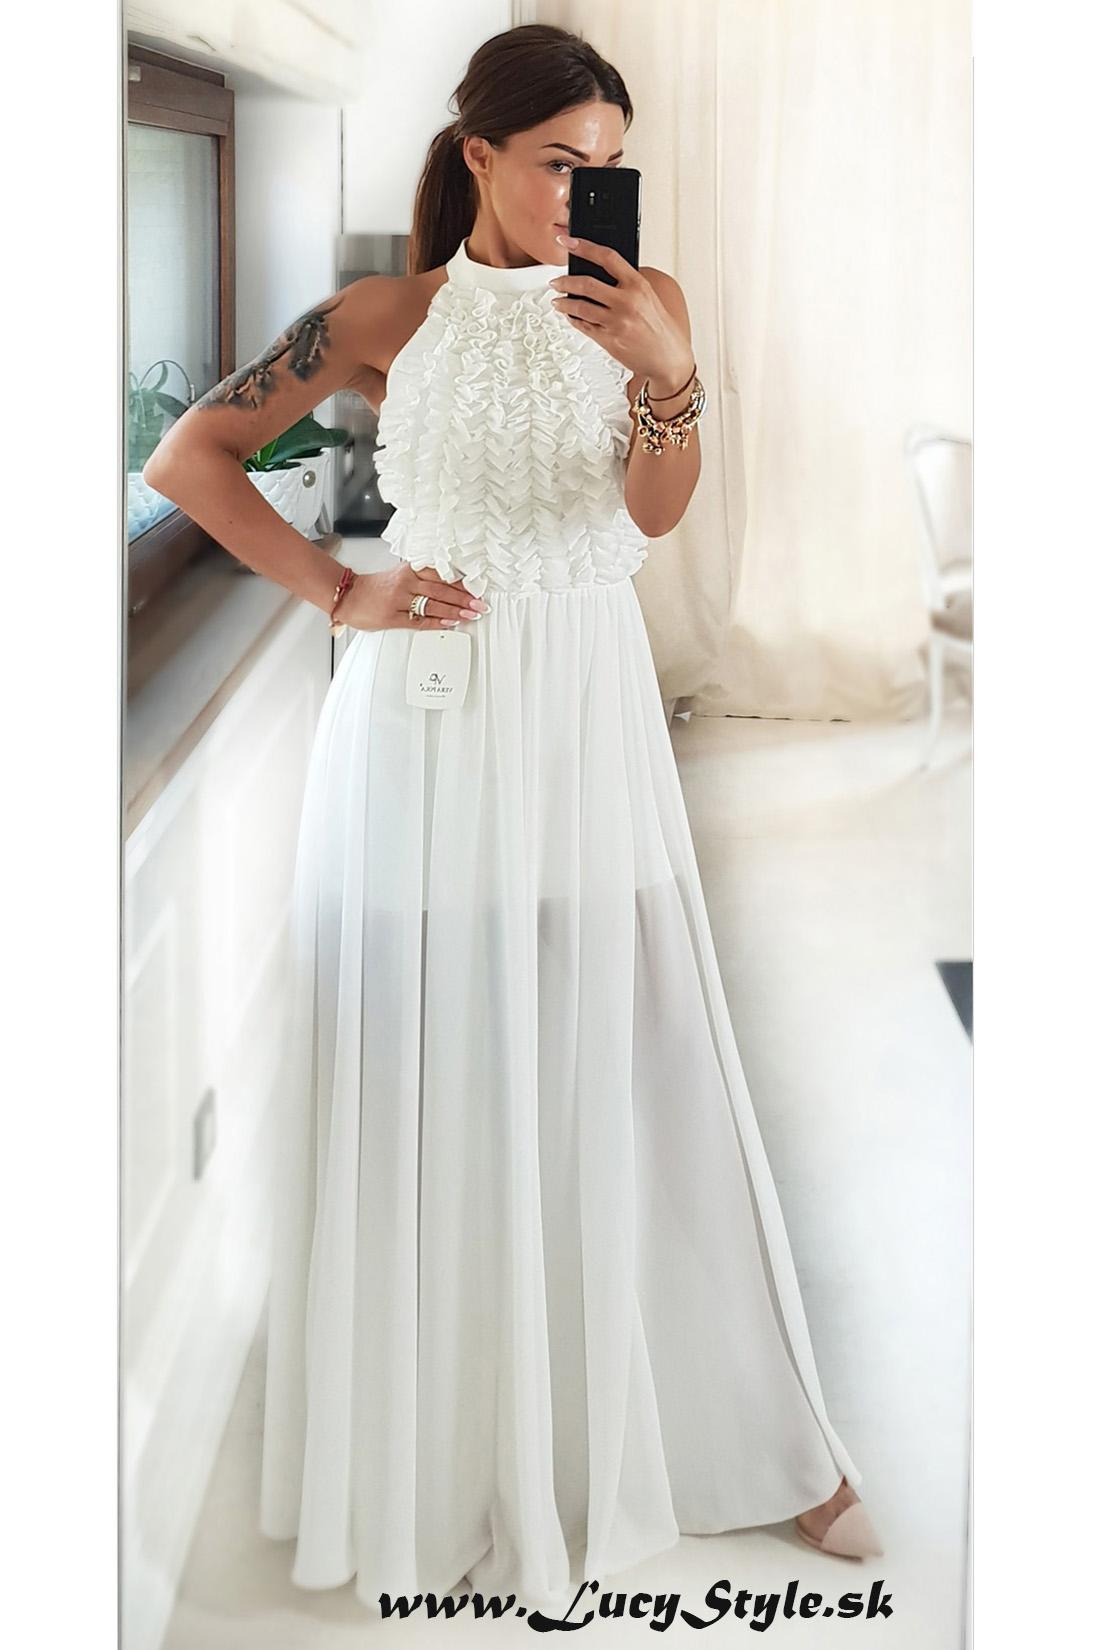 Luxusné spoločenské dámske šaty ,biele (Luxusné spoločenské dámske šaty ,biele)